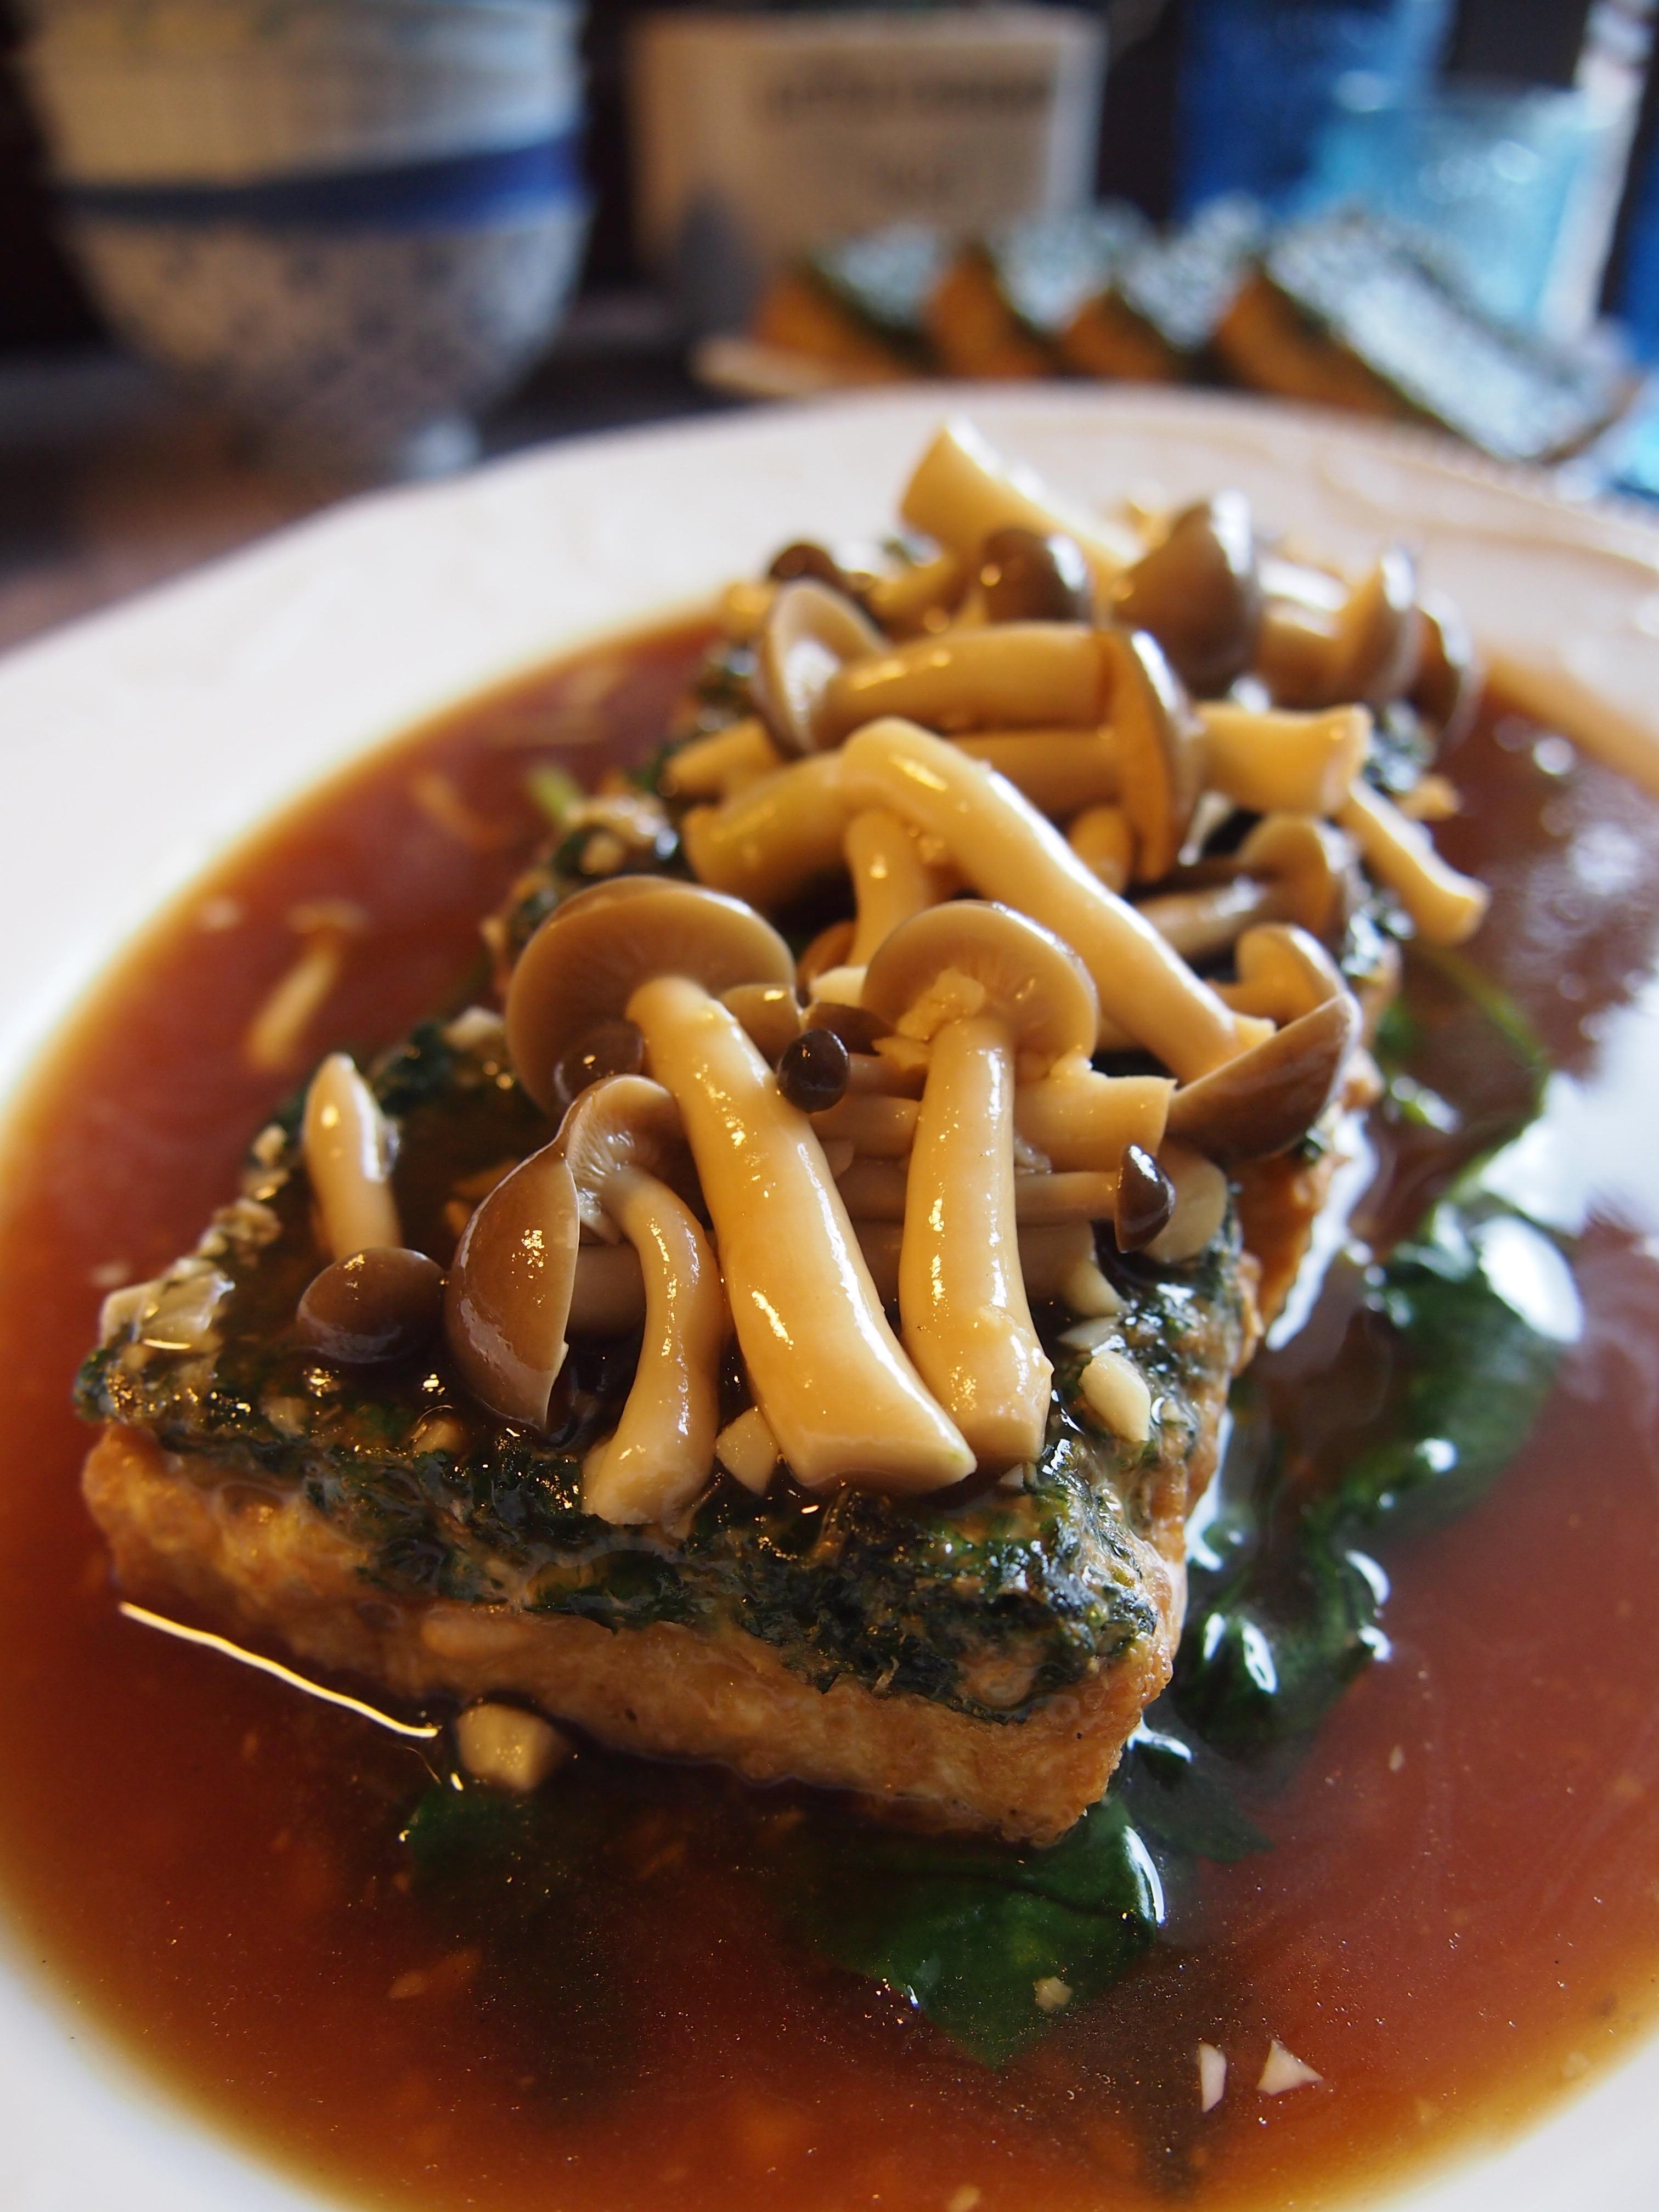 Surprisingly Easy Homemade Spinach Tofu with Shimeiji Mushrooms